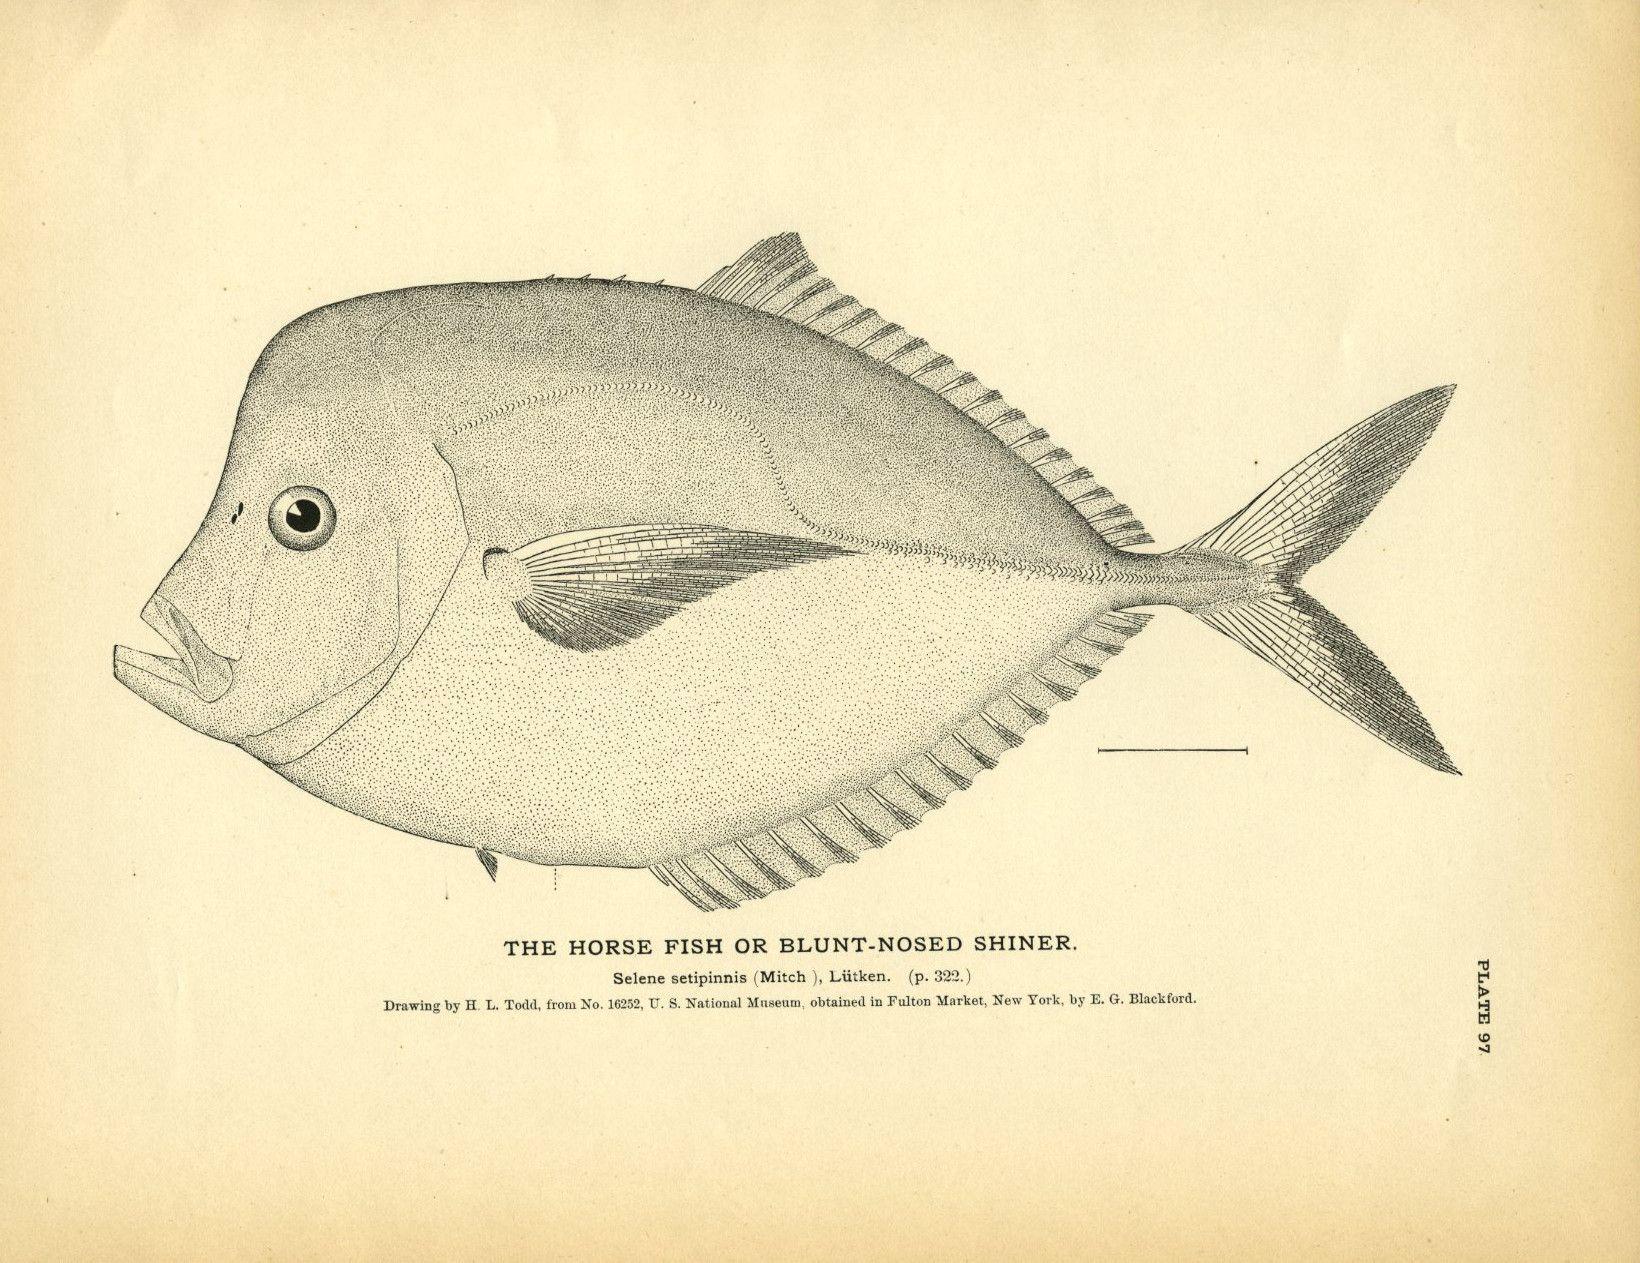 Horse Fish